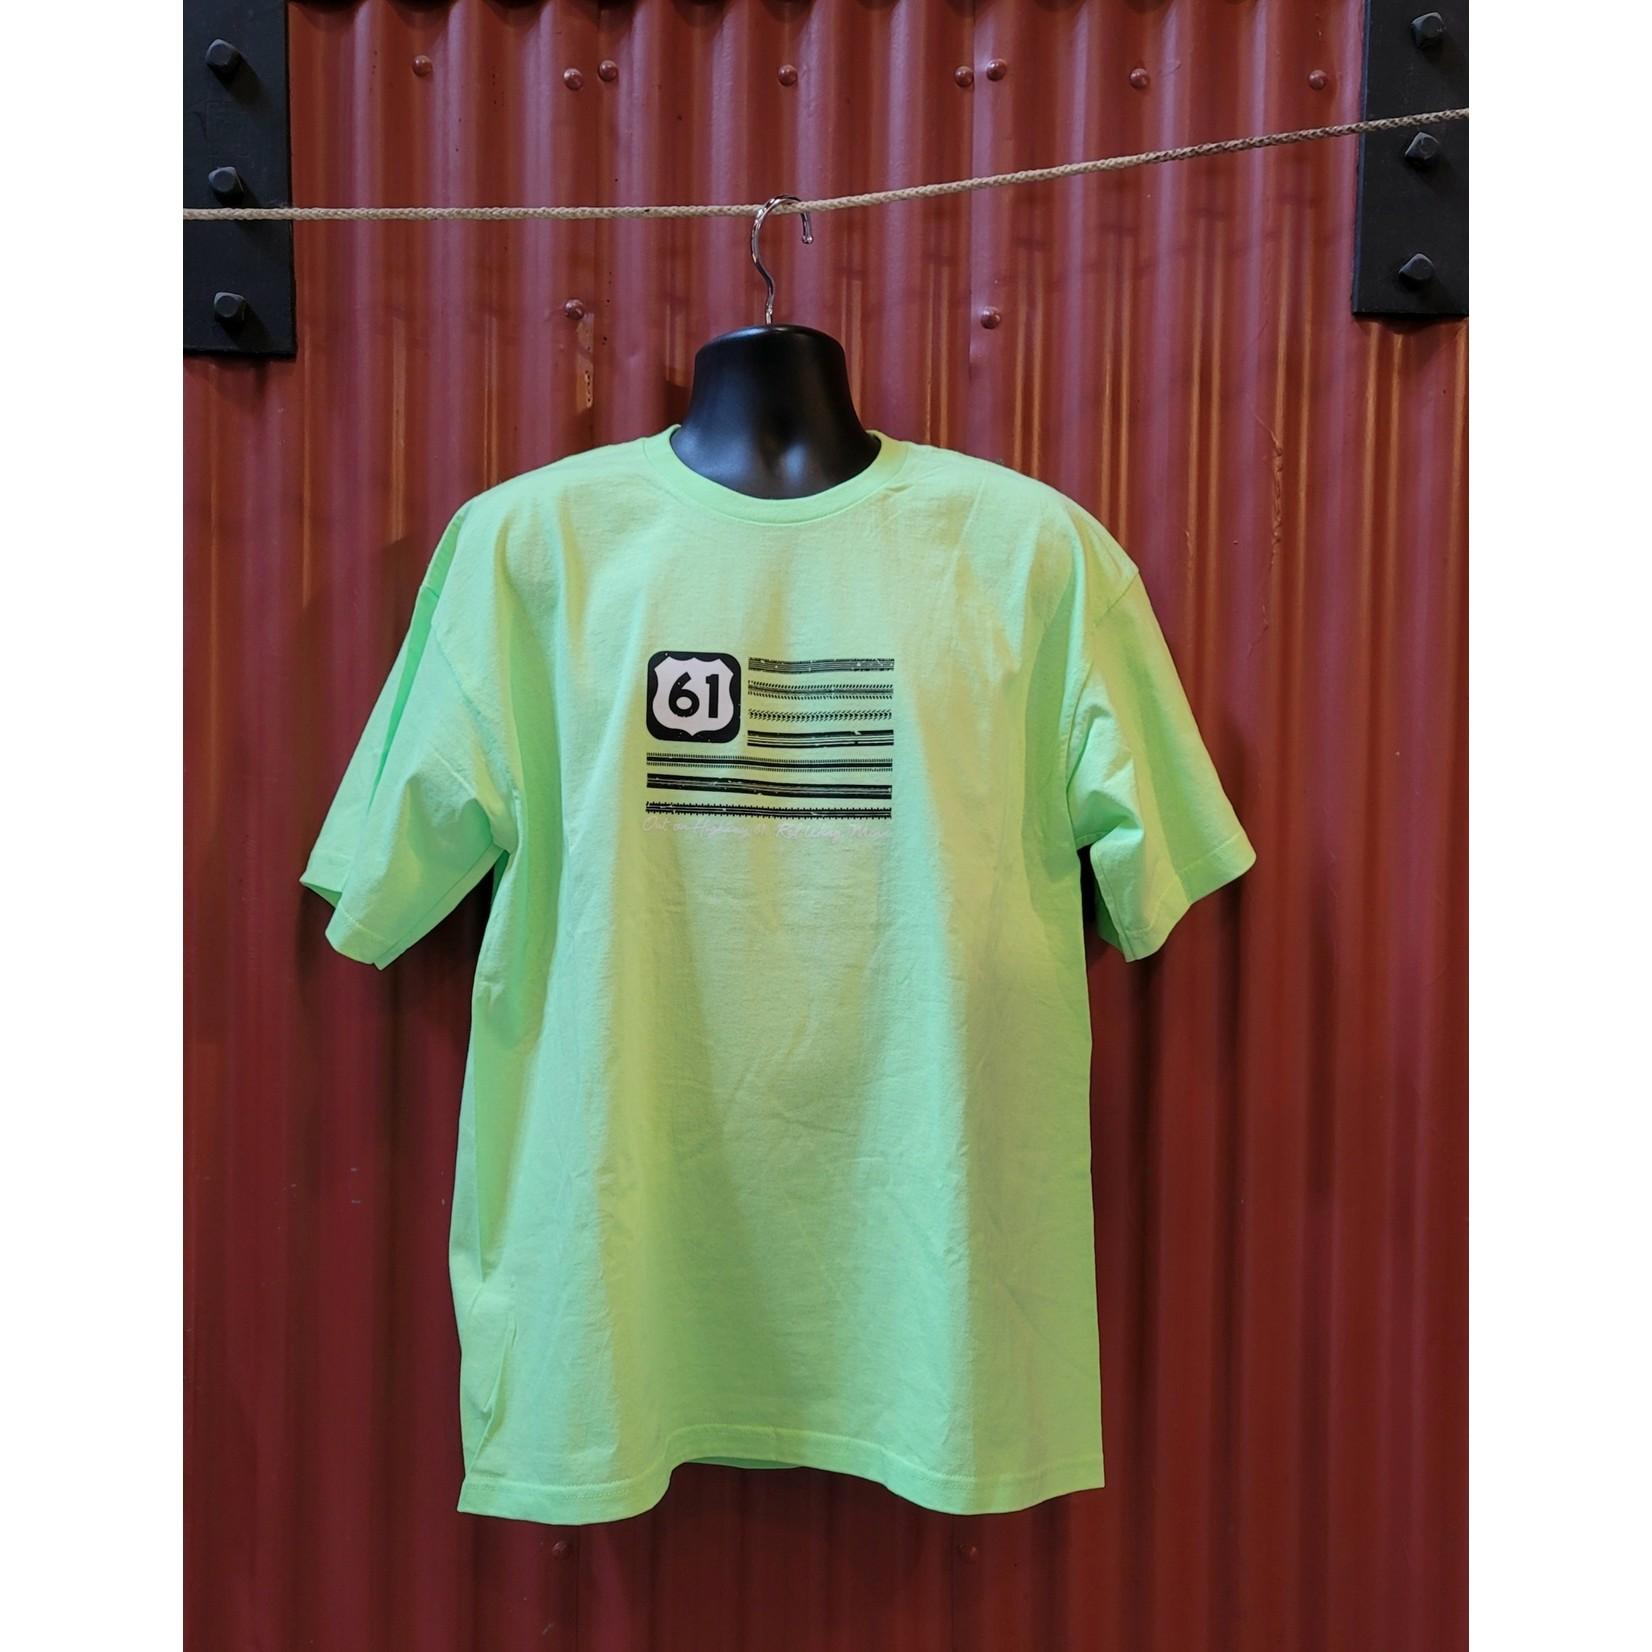 Bordertown Highway 61 Tread T Shirt